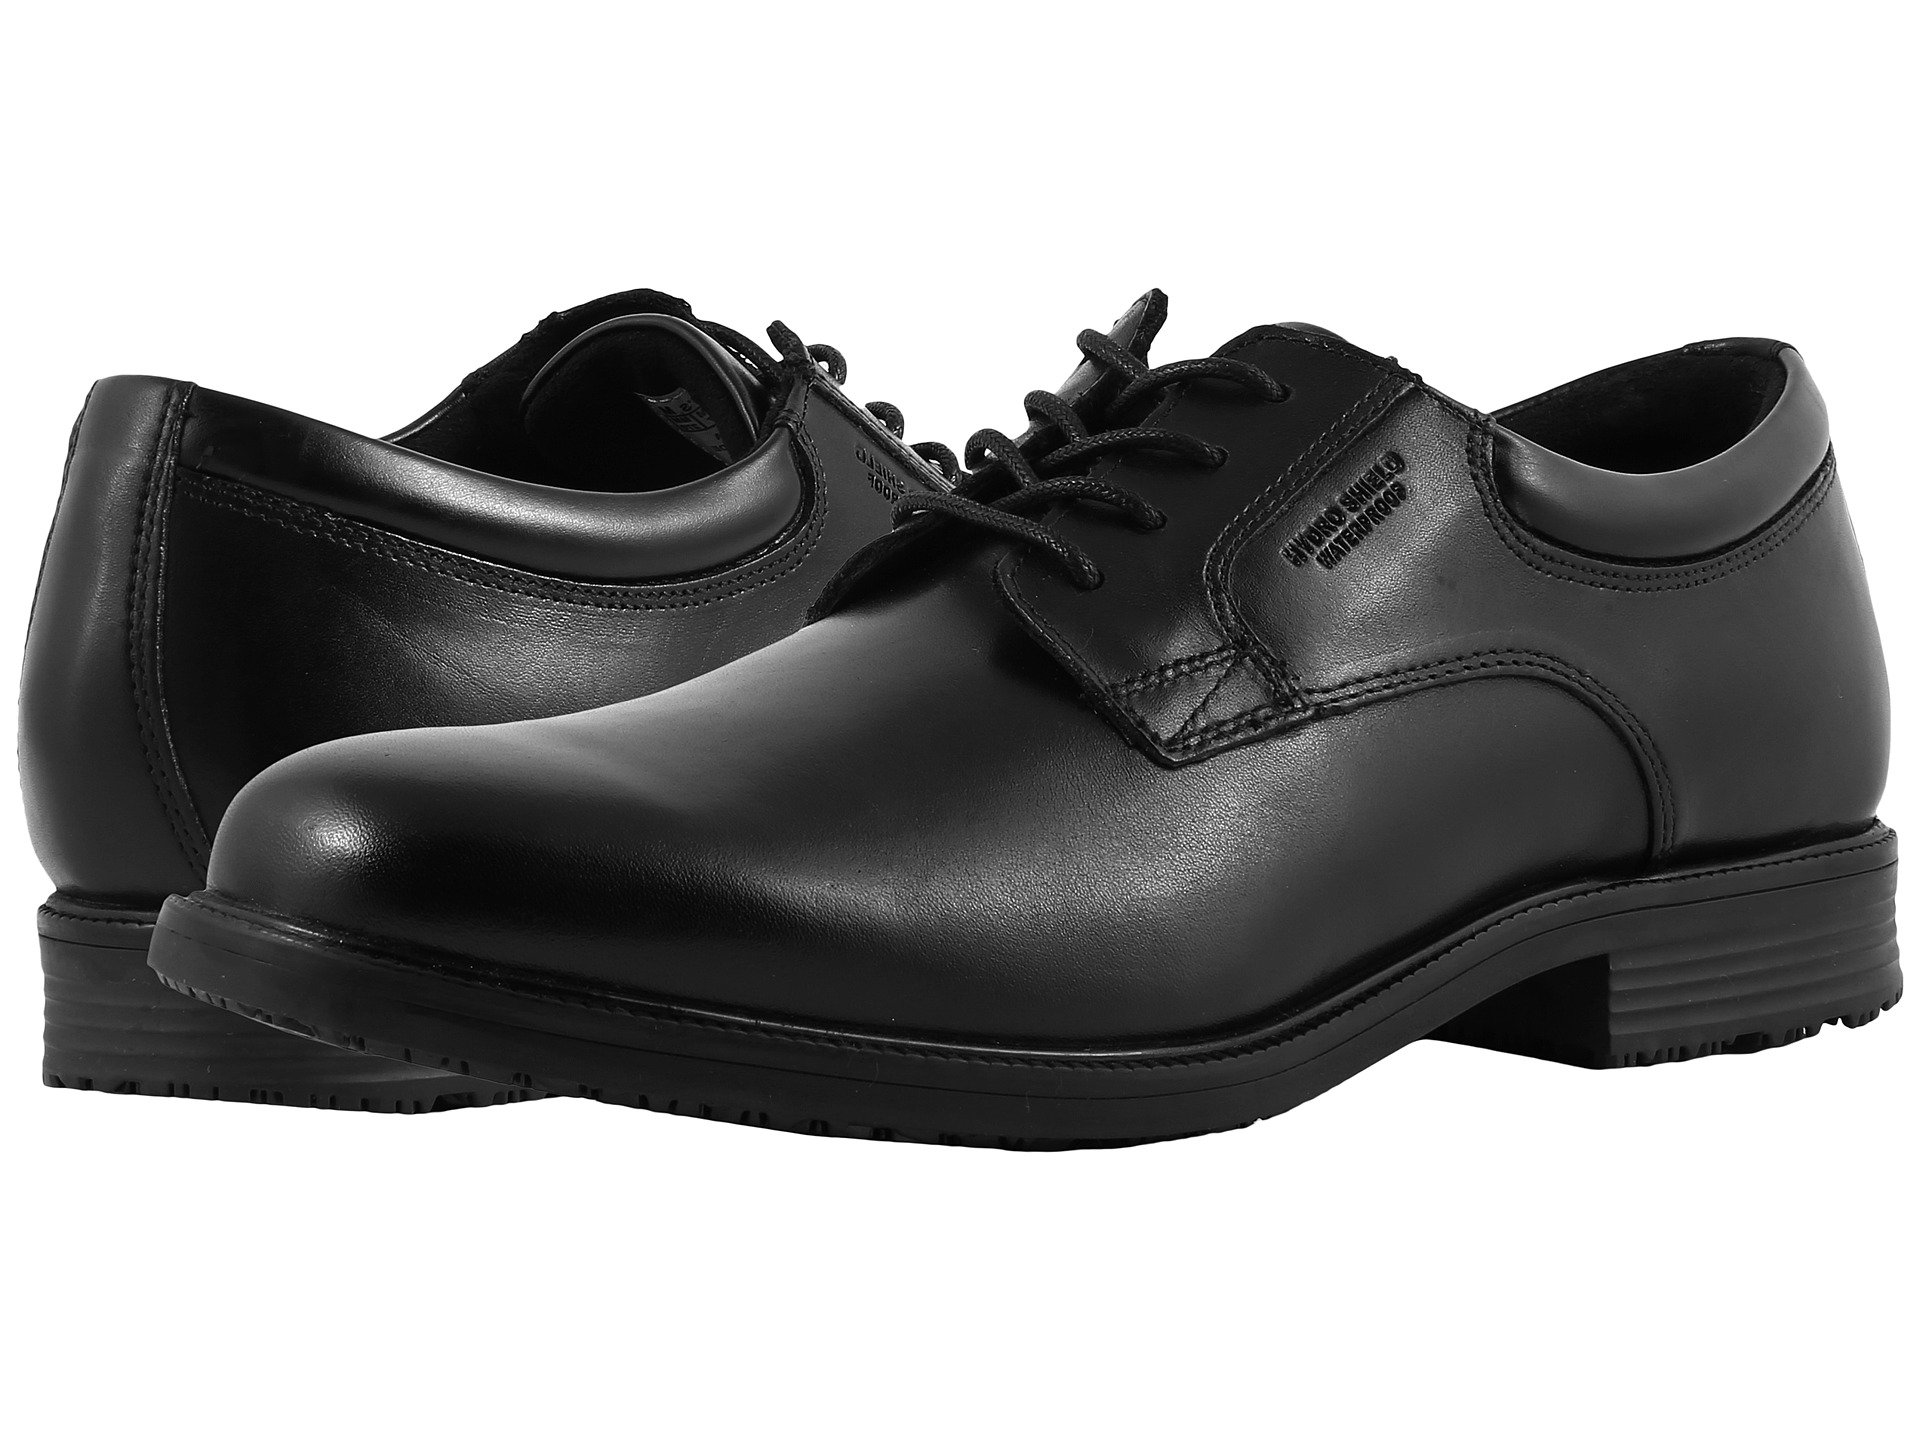 241a922d458 Black. 825. Rockport. Essential Details Waterproof Plain Toe Oxford